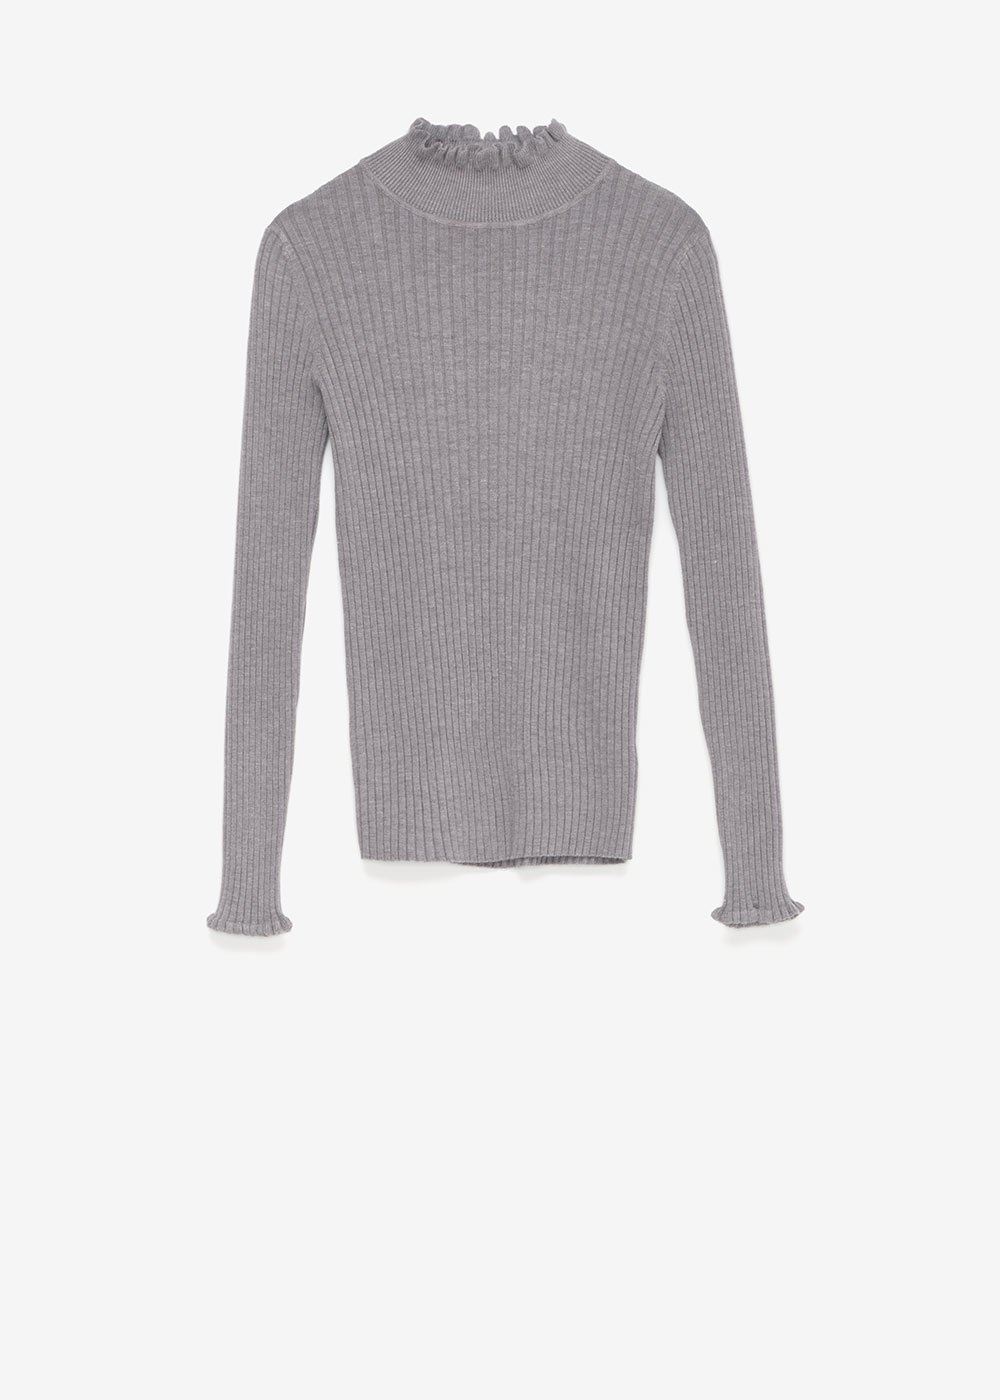 Maris sweater with ruffled neck - Medium Grey - Woman